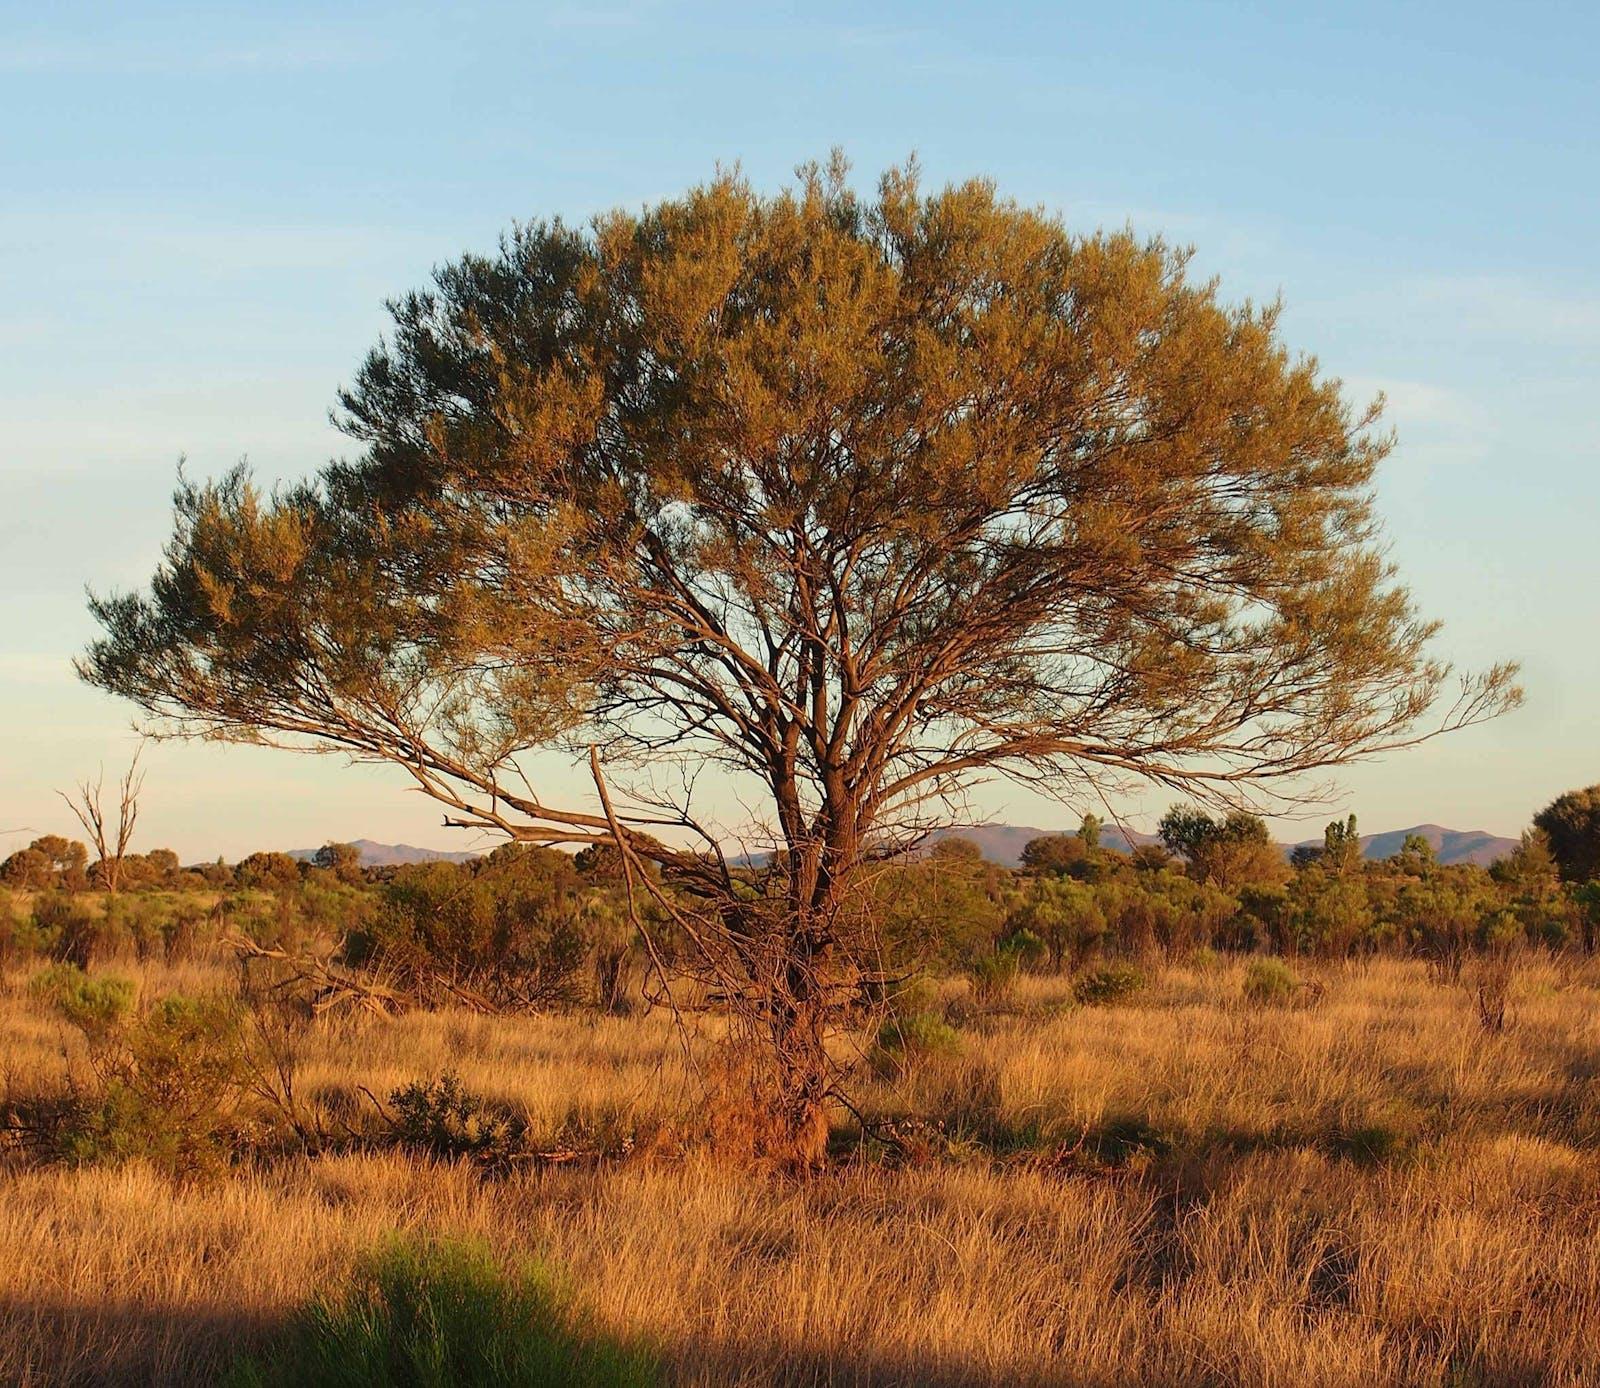 Western Australian Mulga Shrublands